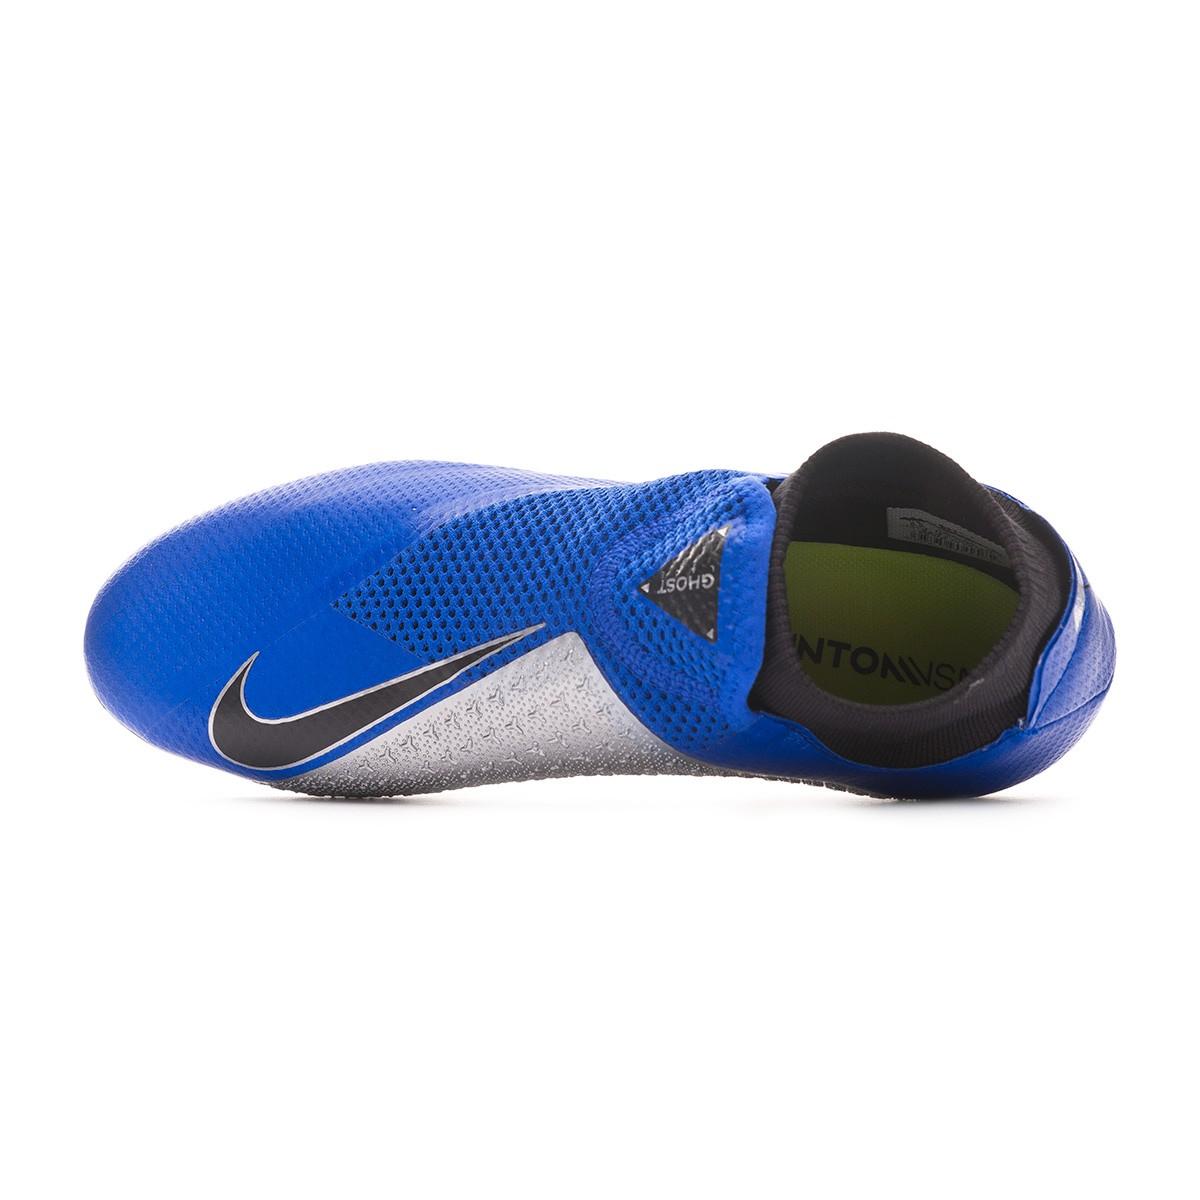 9dbe4371866 Football Boots Nike Phantom Vision Pro DF AG-Pro Racer blue-Black-Metallic  silver-Volt - Football store Fútbol Emotion